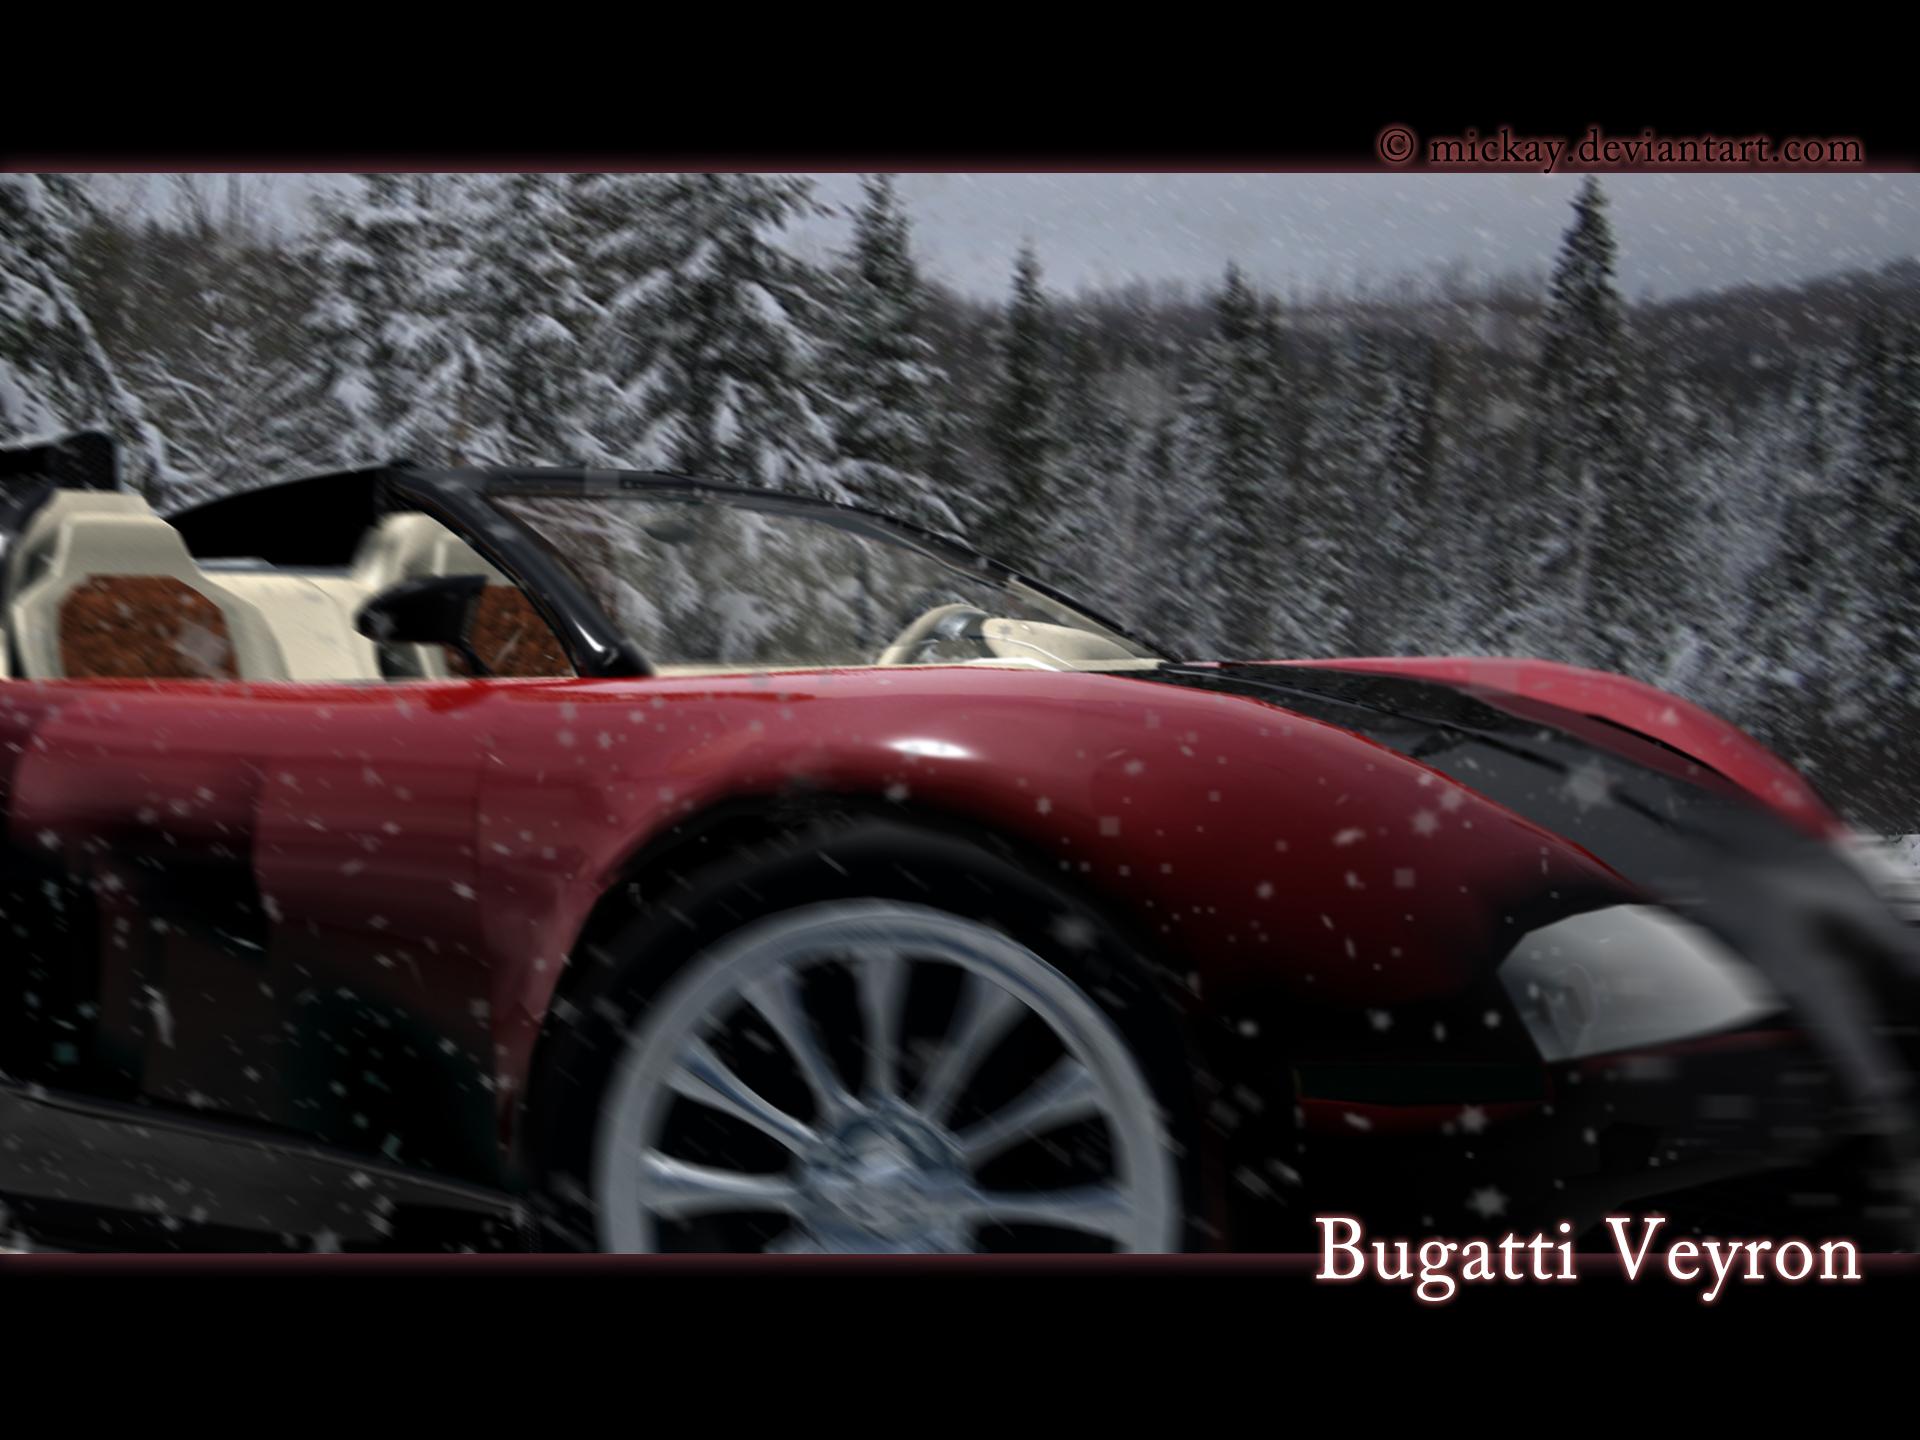 bugatti_veyron___snow_by_mickay Inspiring Bugatti Veyron Price Australian Dollars Cars Trend